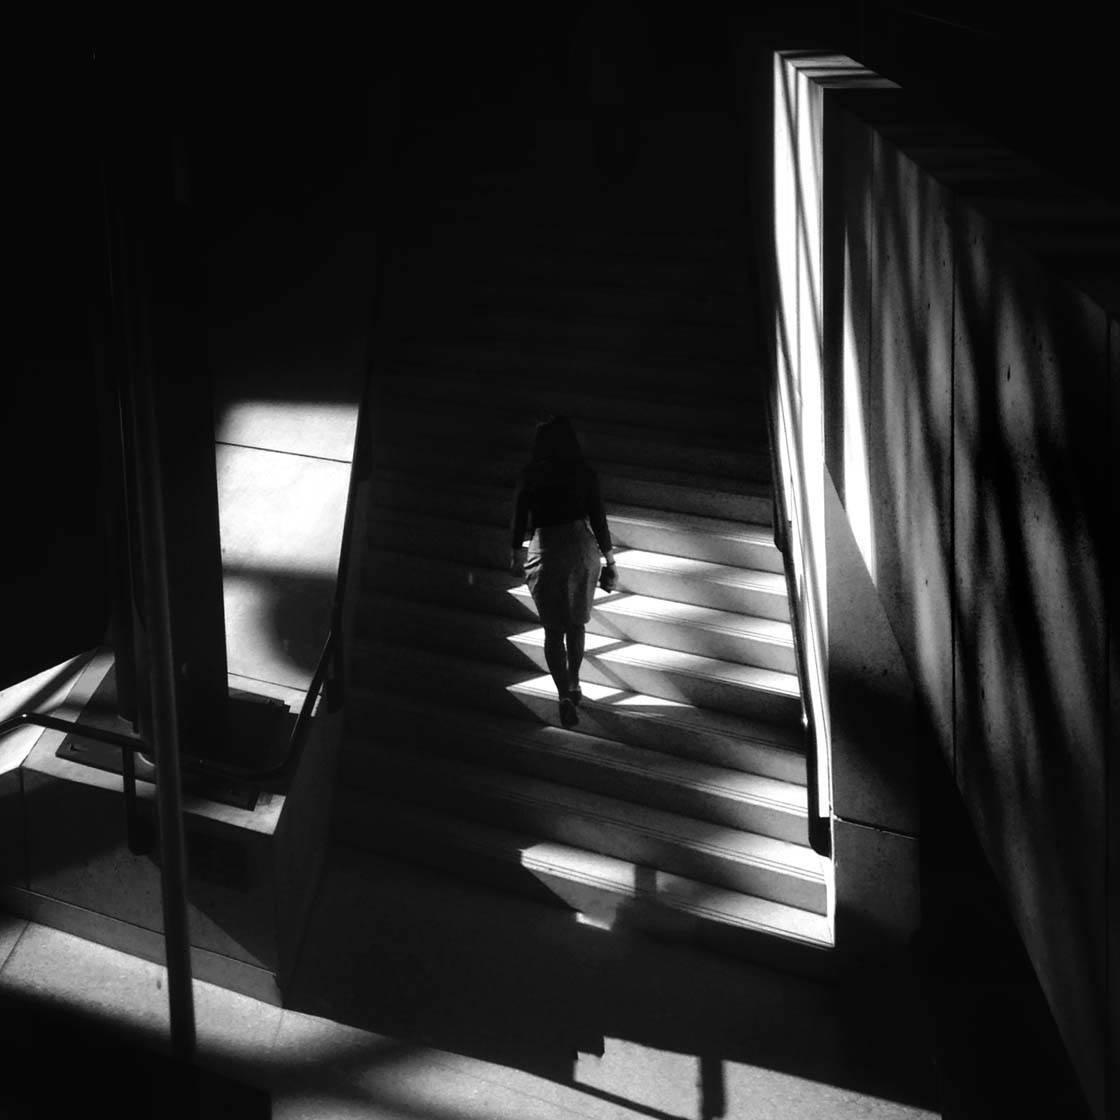 Shadow iPhone Photos 26